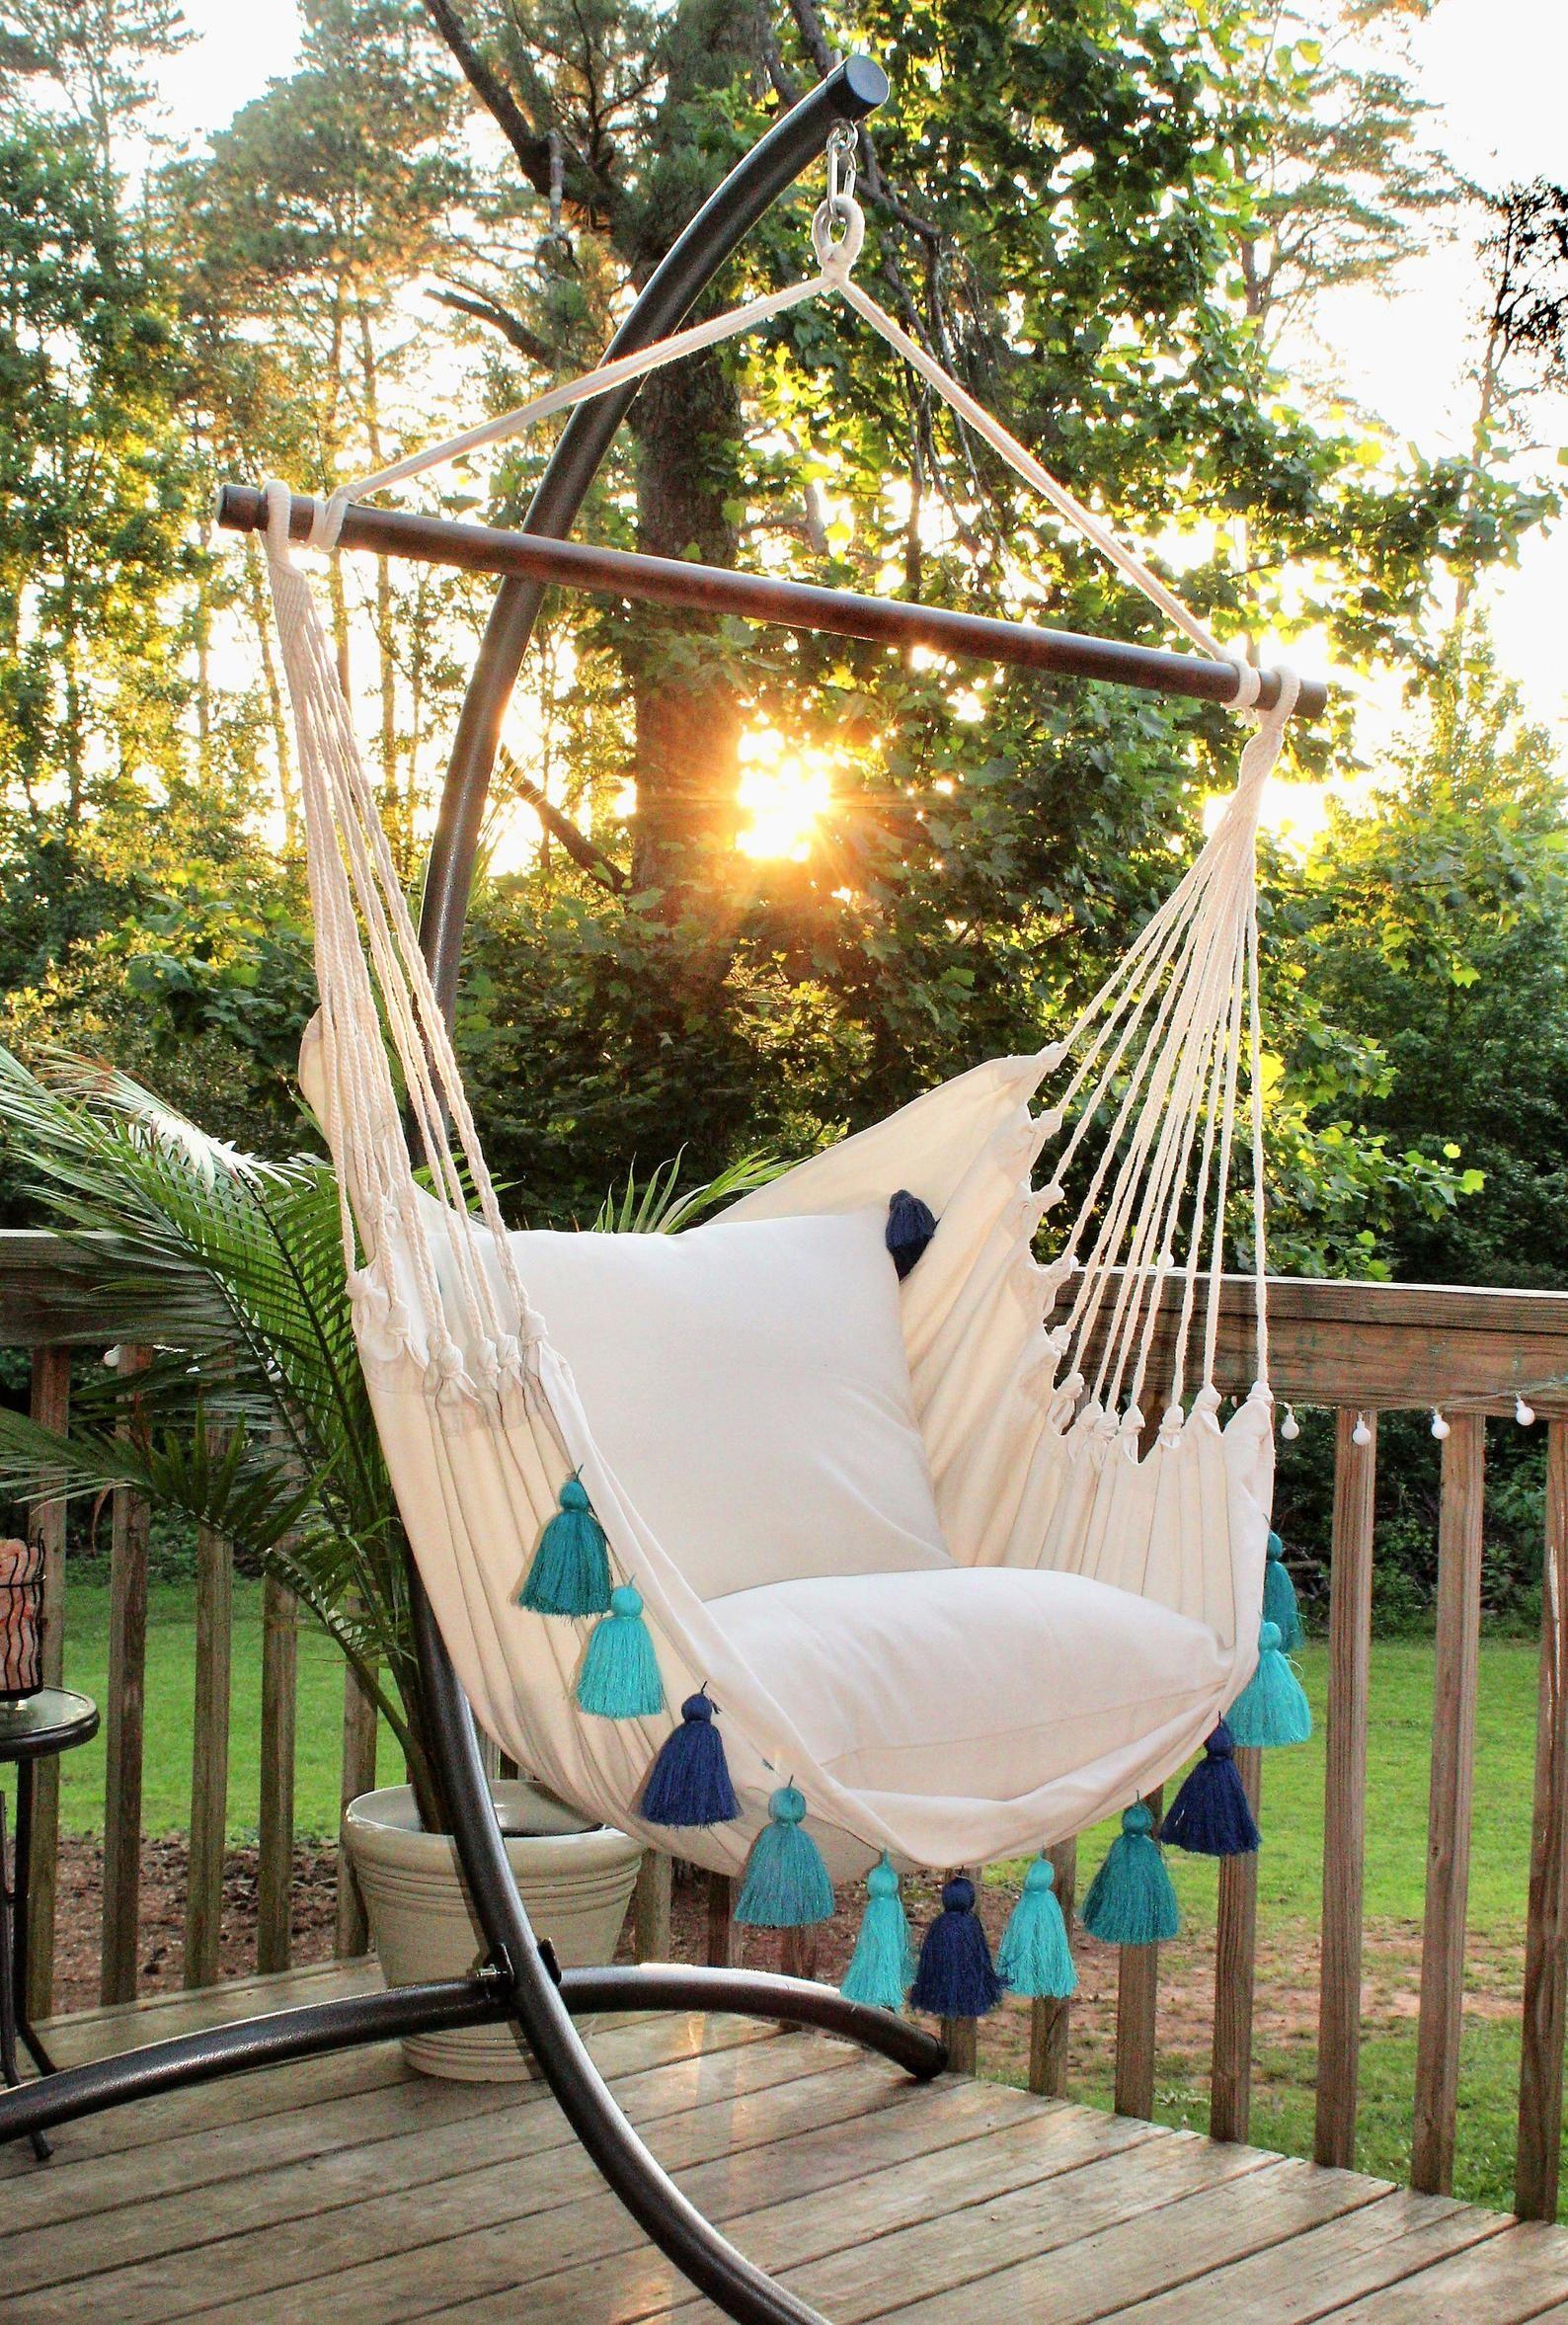 Park Art|My WordPress Blog_Gardenline Boho Hanging Chair Amazon